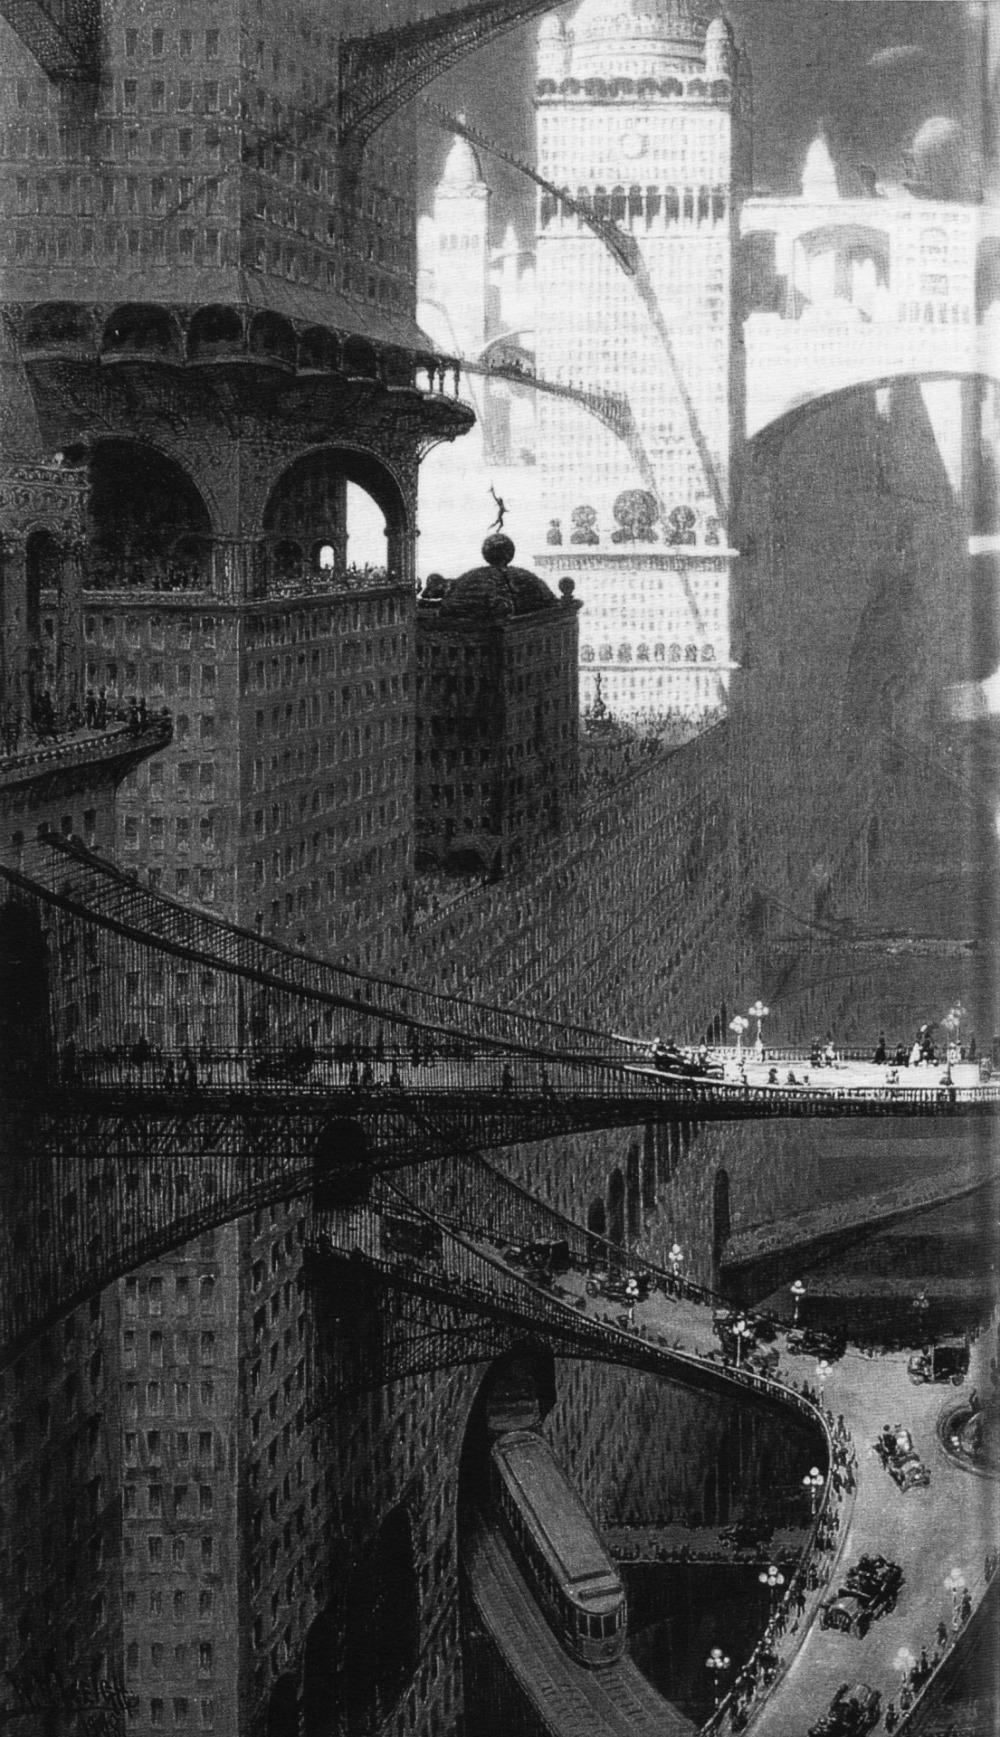 William Robinson Leigh, Visionary City, 1908.